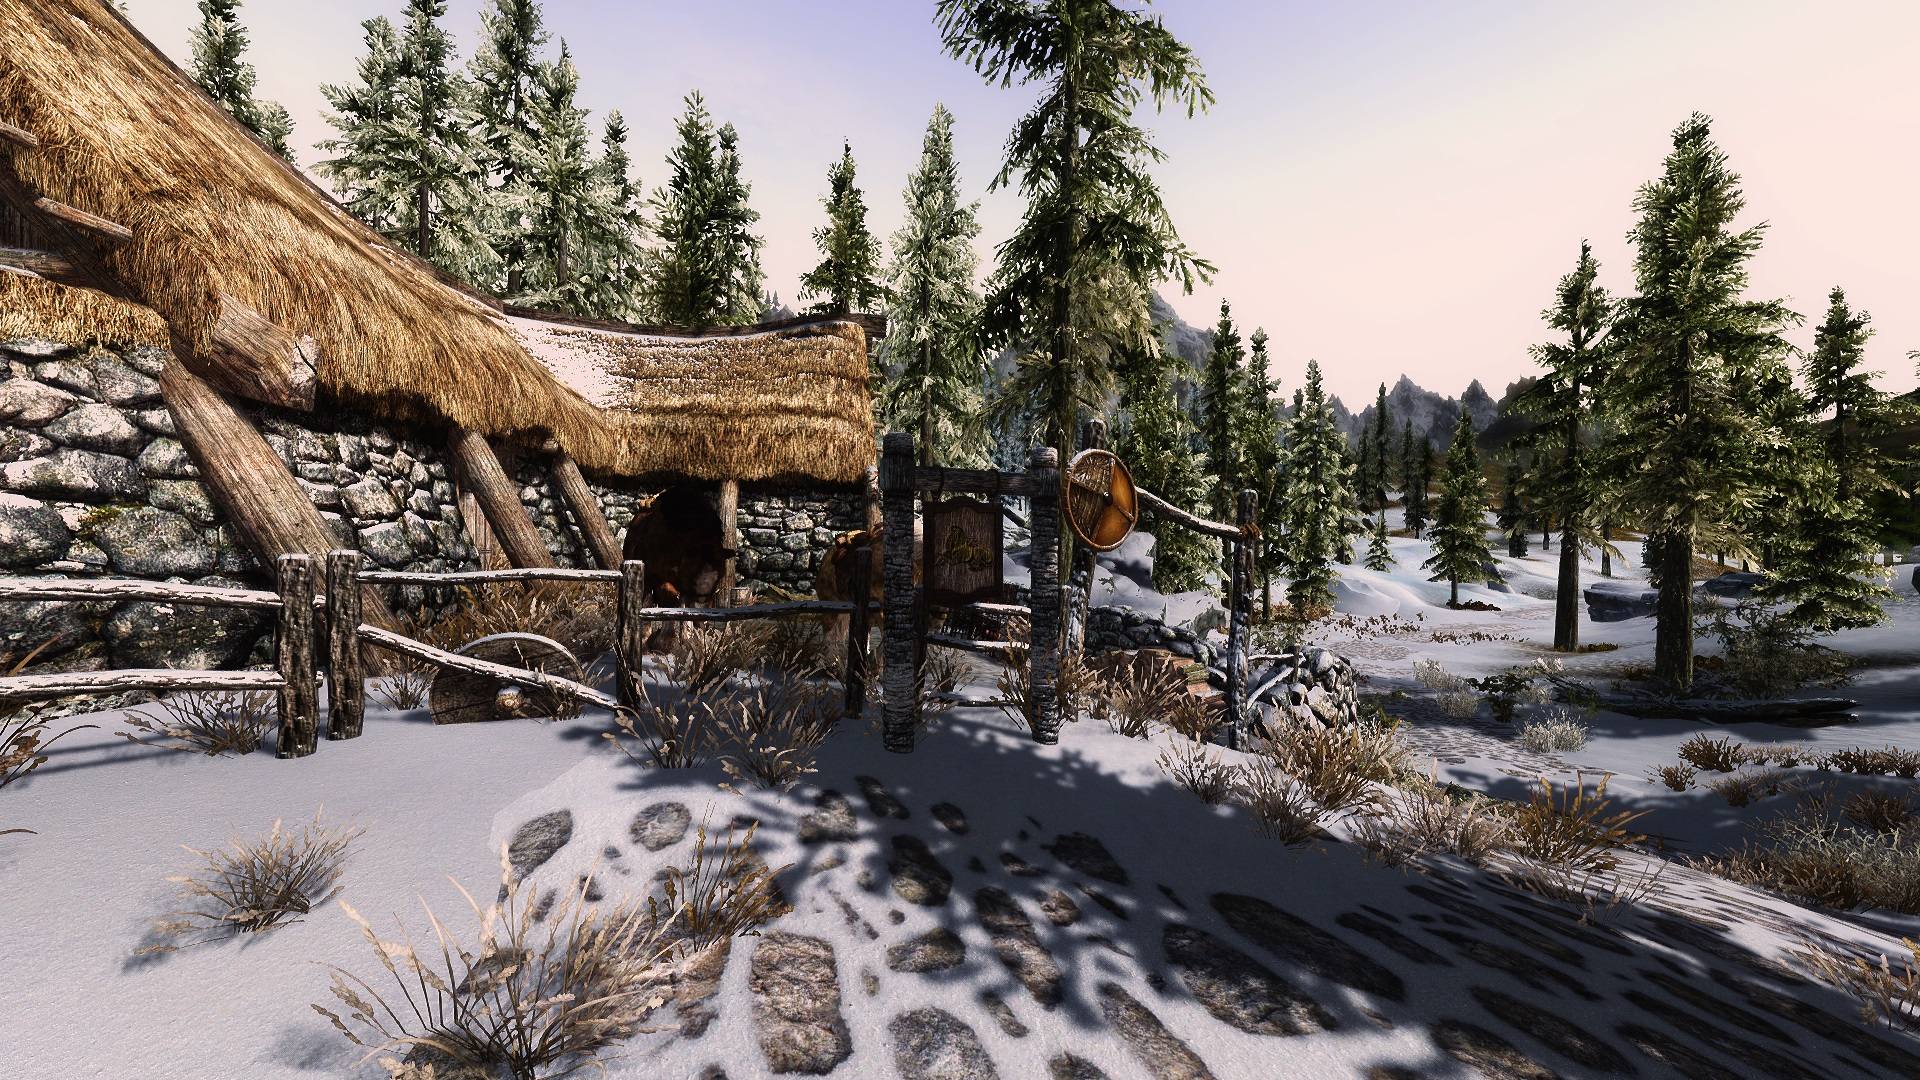 [Post Oficial] The Elder Scrolls V: Skyrim Edición Legendaria  - Página 26 The_elder_scrolls_v-3360638